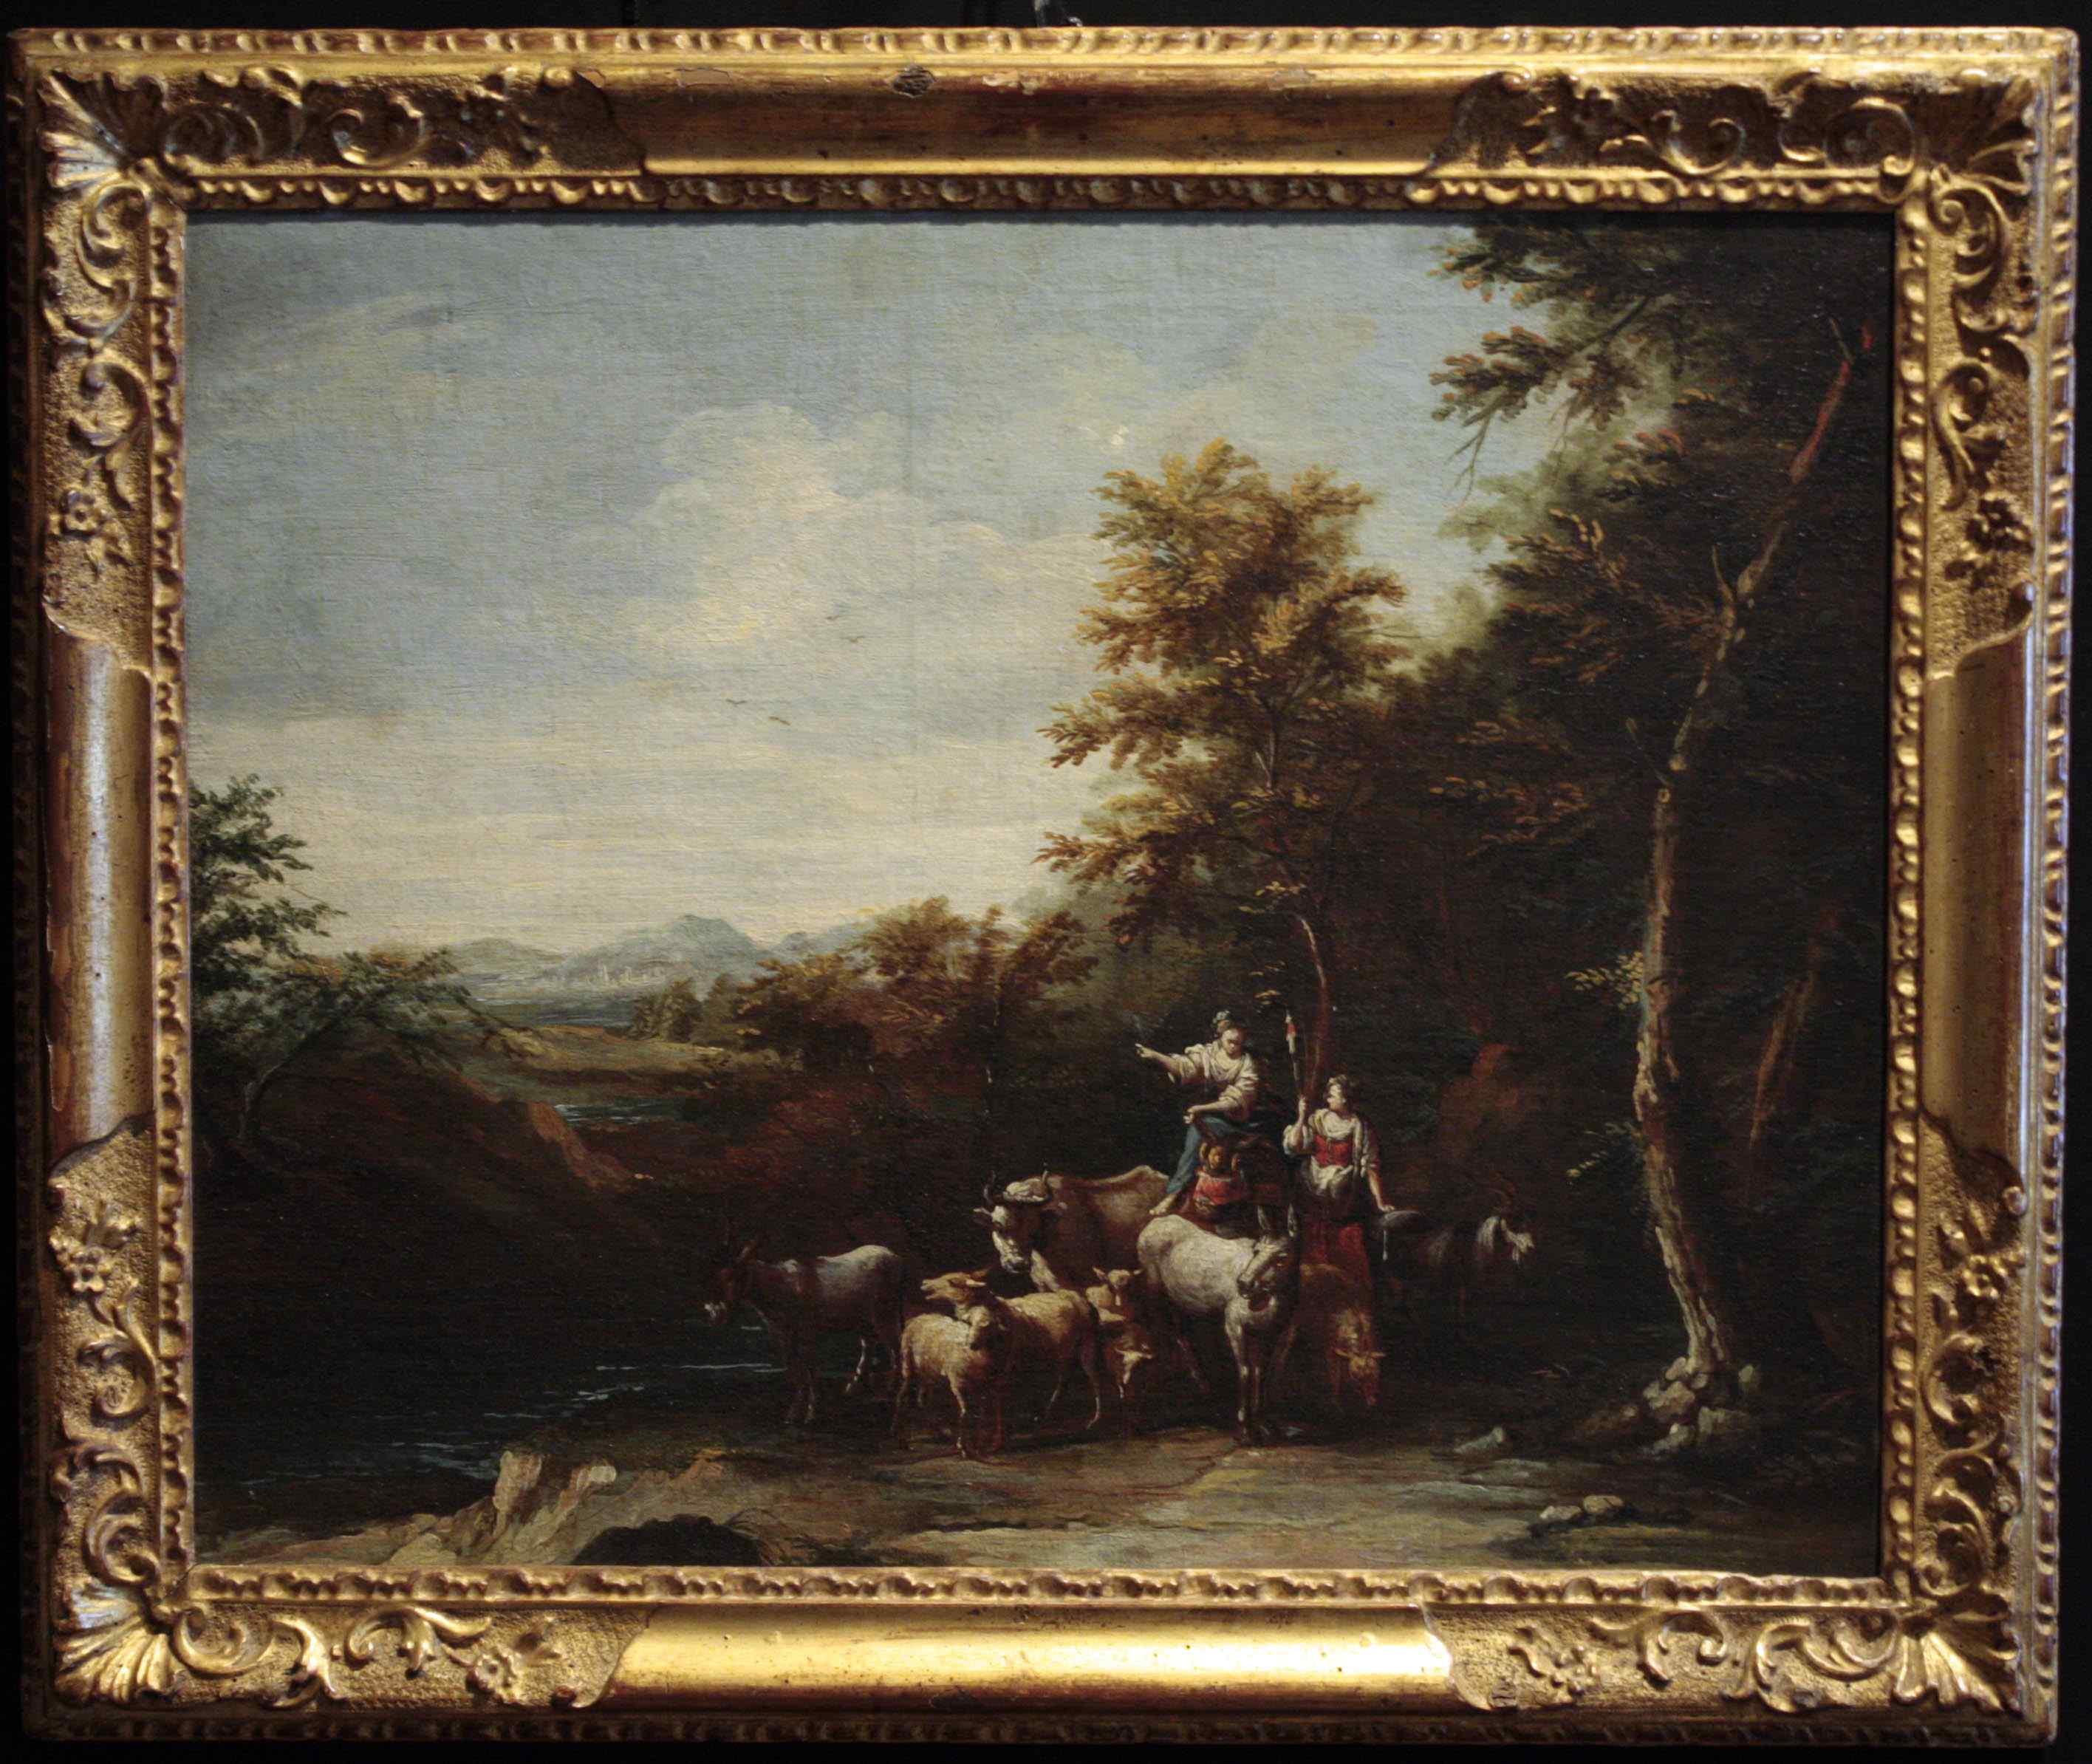 Zais Джузеппе (1709-1774) - Пейзаж с фермерами и Армена